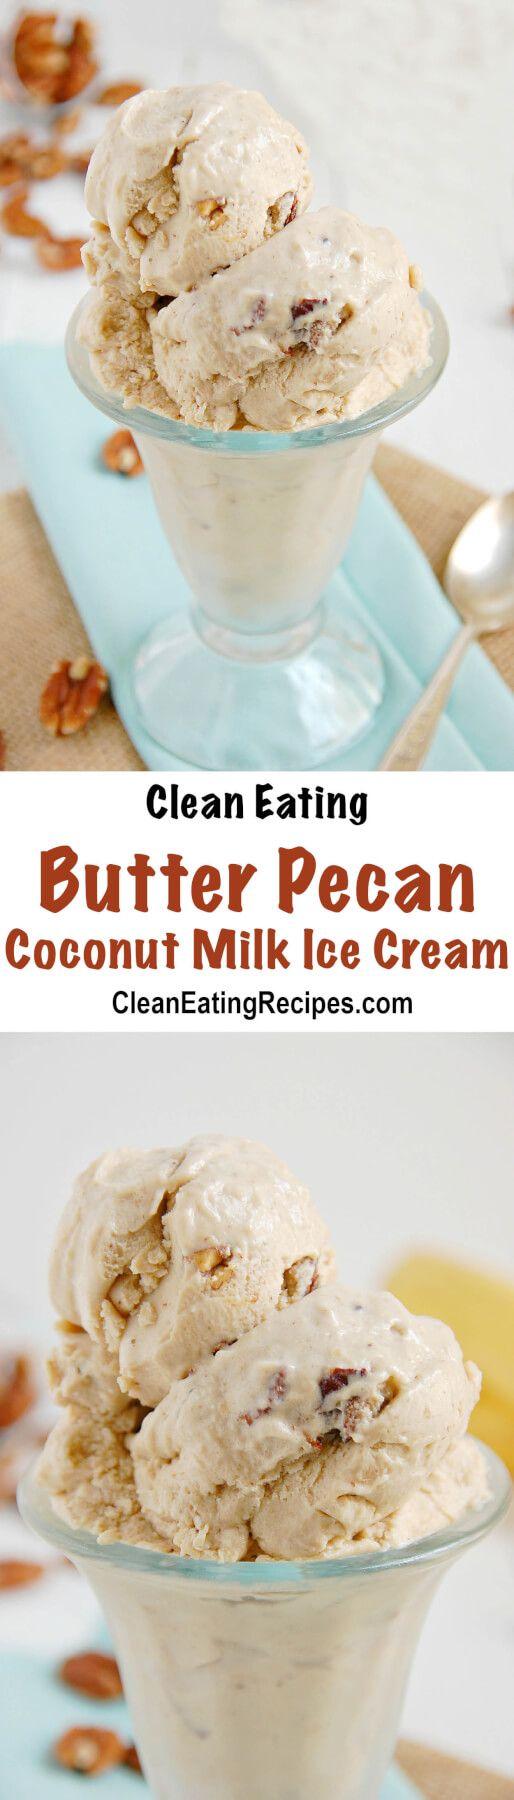 Butter Pecan Coconut Milk Ice Cream #justeatrealfood #cleaneatingrecipes